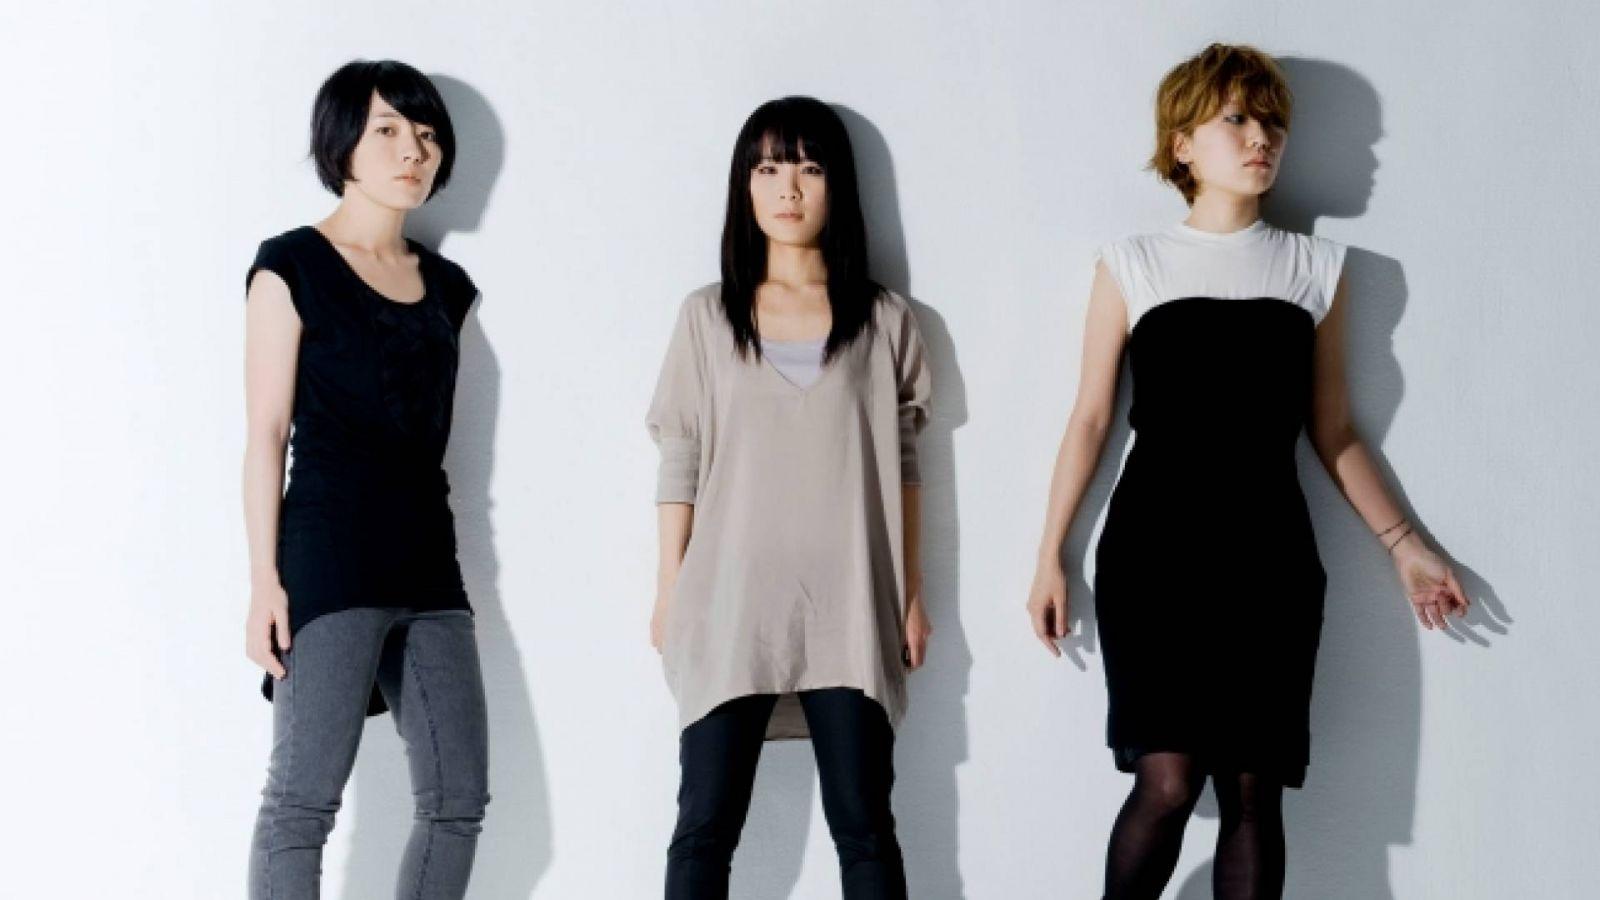 Chatmonchy Joins Japan Nite Tour © Sony Music Entertainment (Japan) Inc. - Chatmonchy